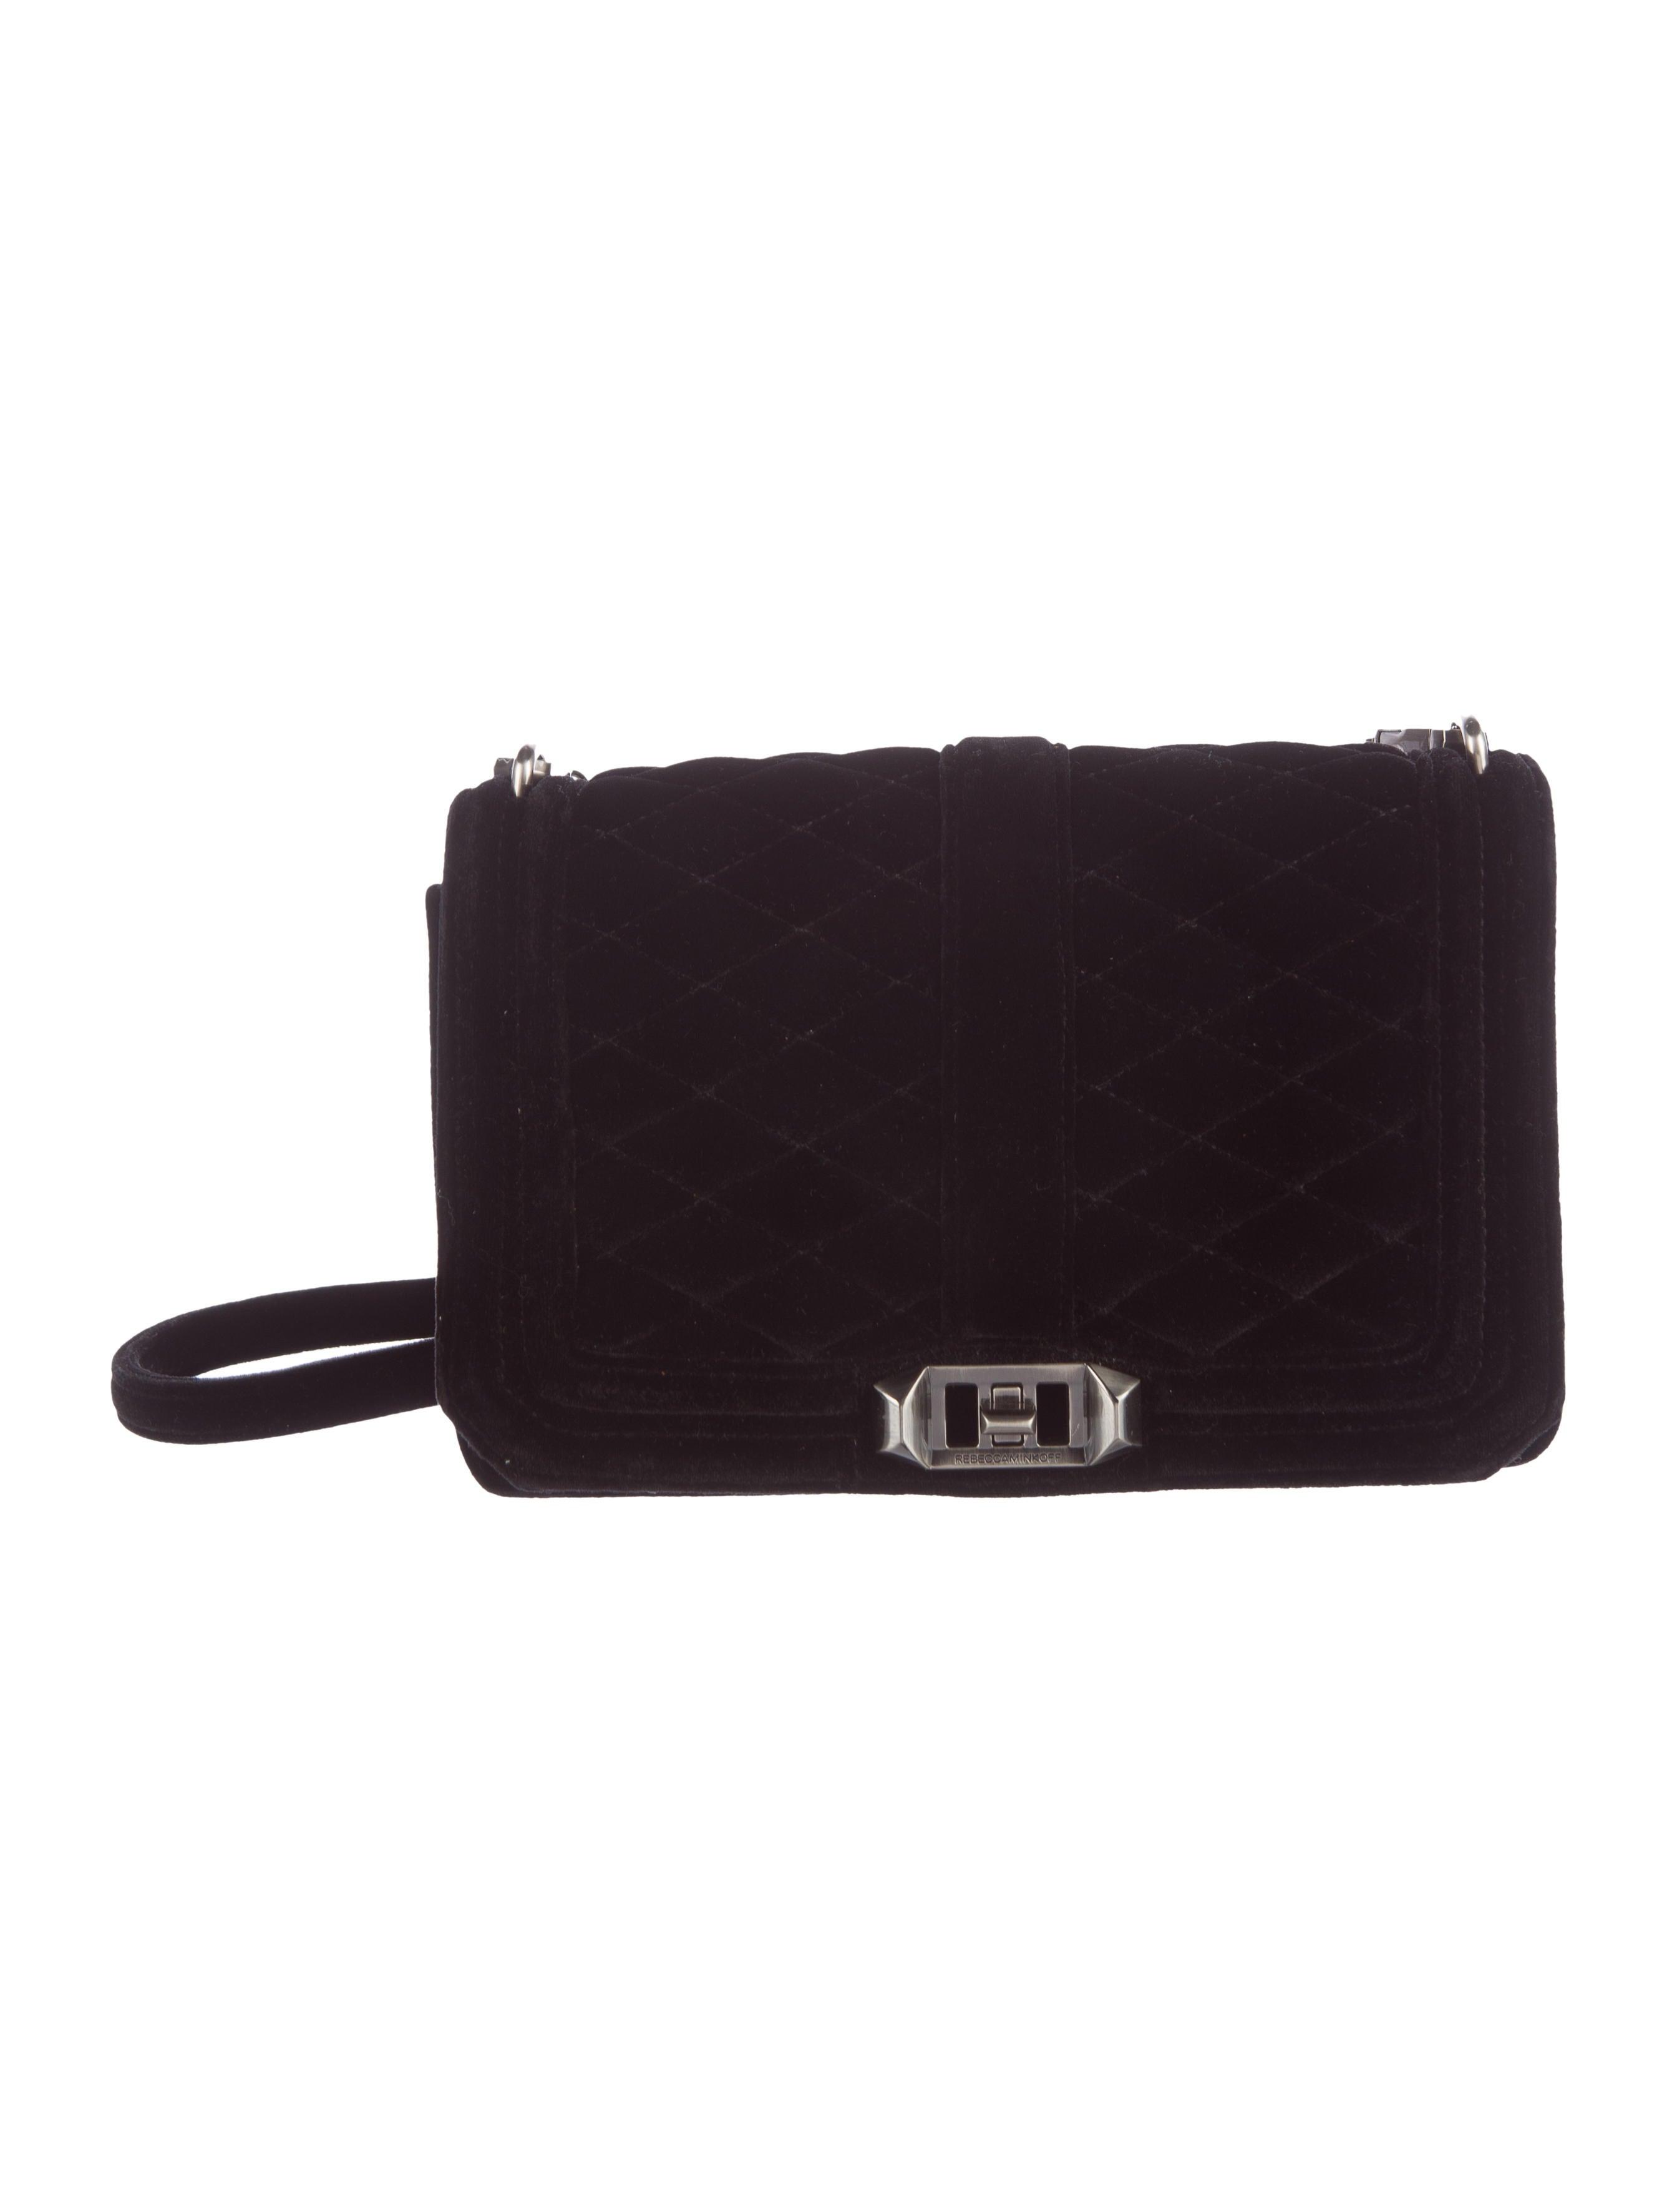 eab3e6a87 Rebecca Minkoff Velvet Love Crossbody Bag - Handbags - WRM28517 ...